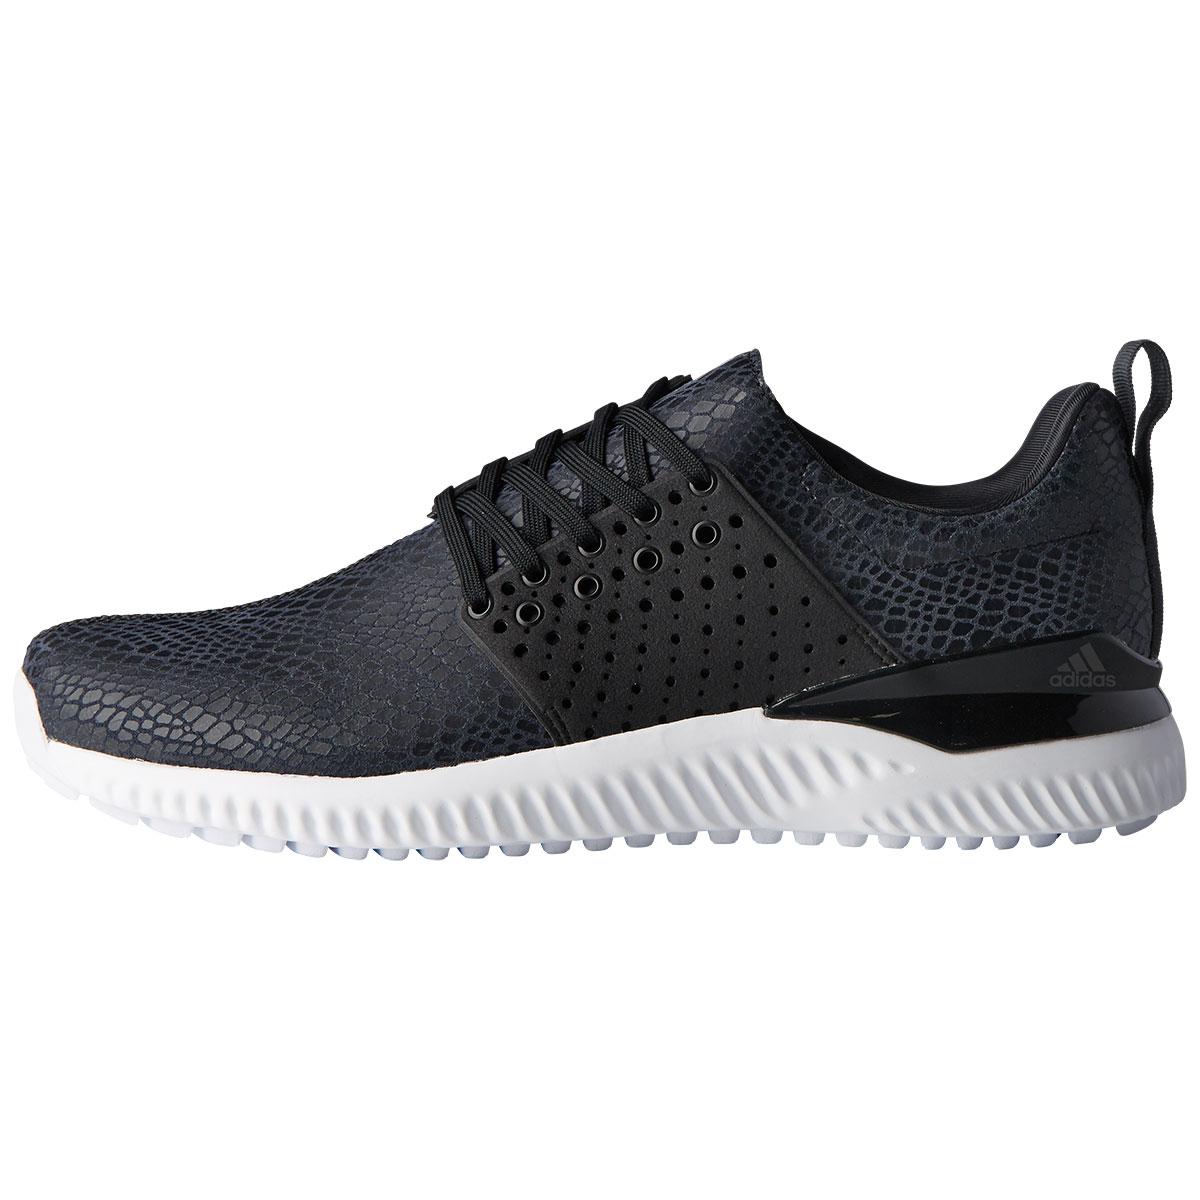 Adidas Men's Adicross Bounce Black Golf Shoe